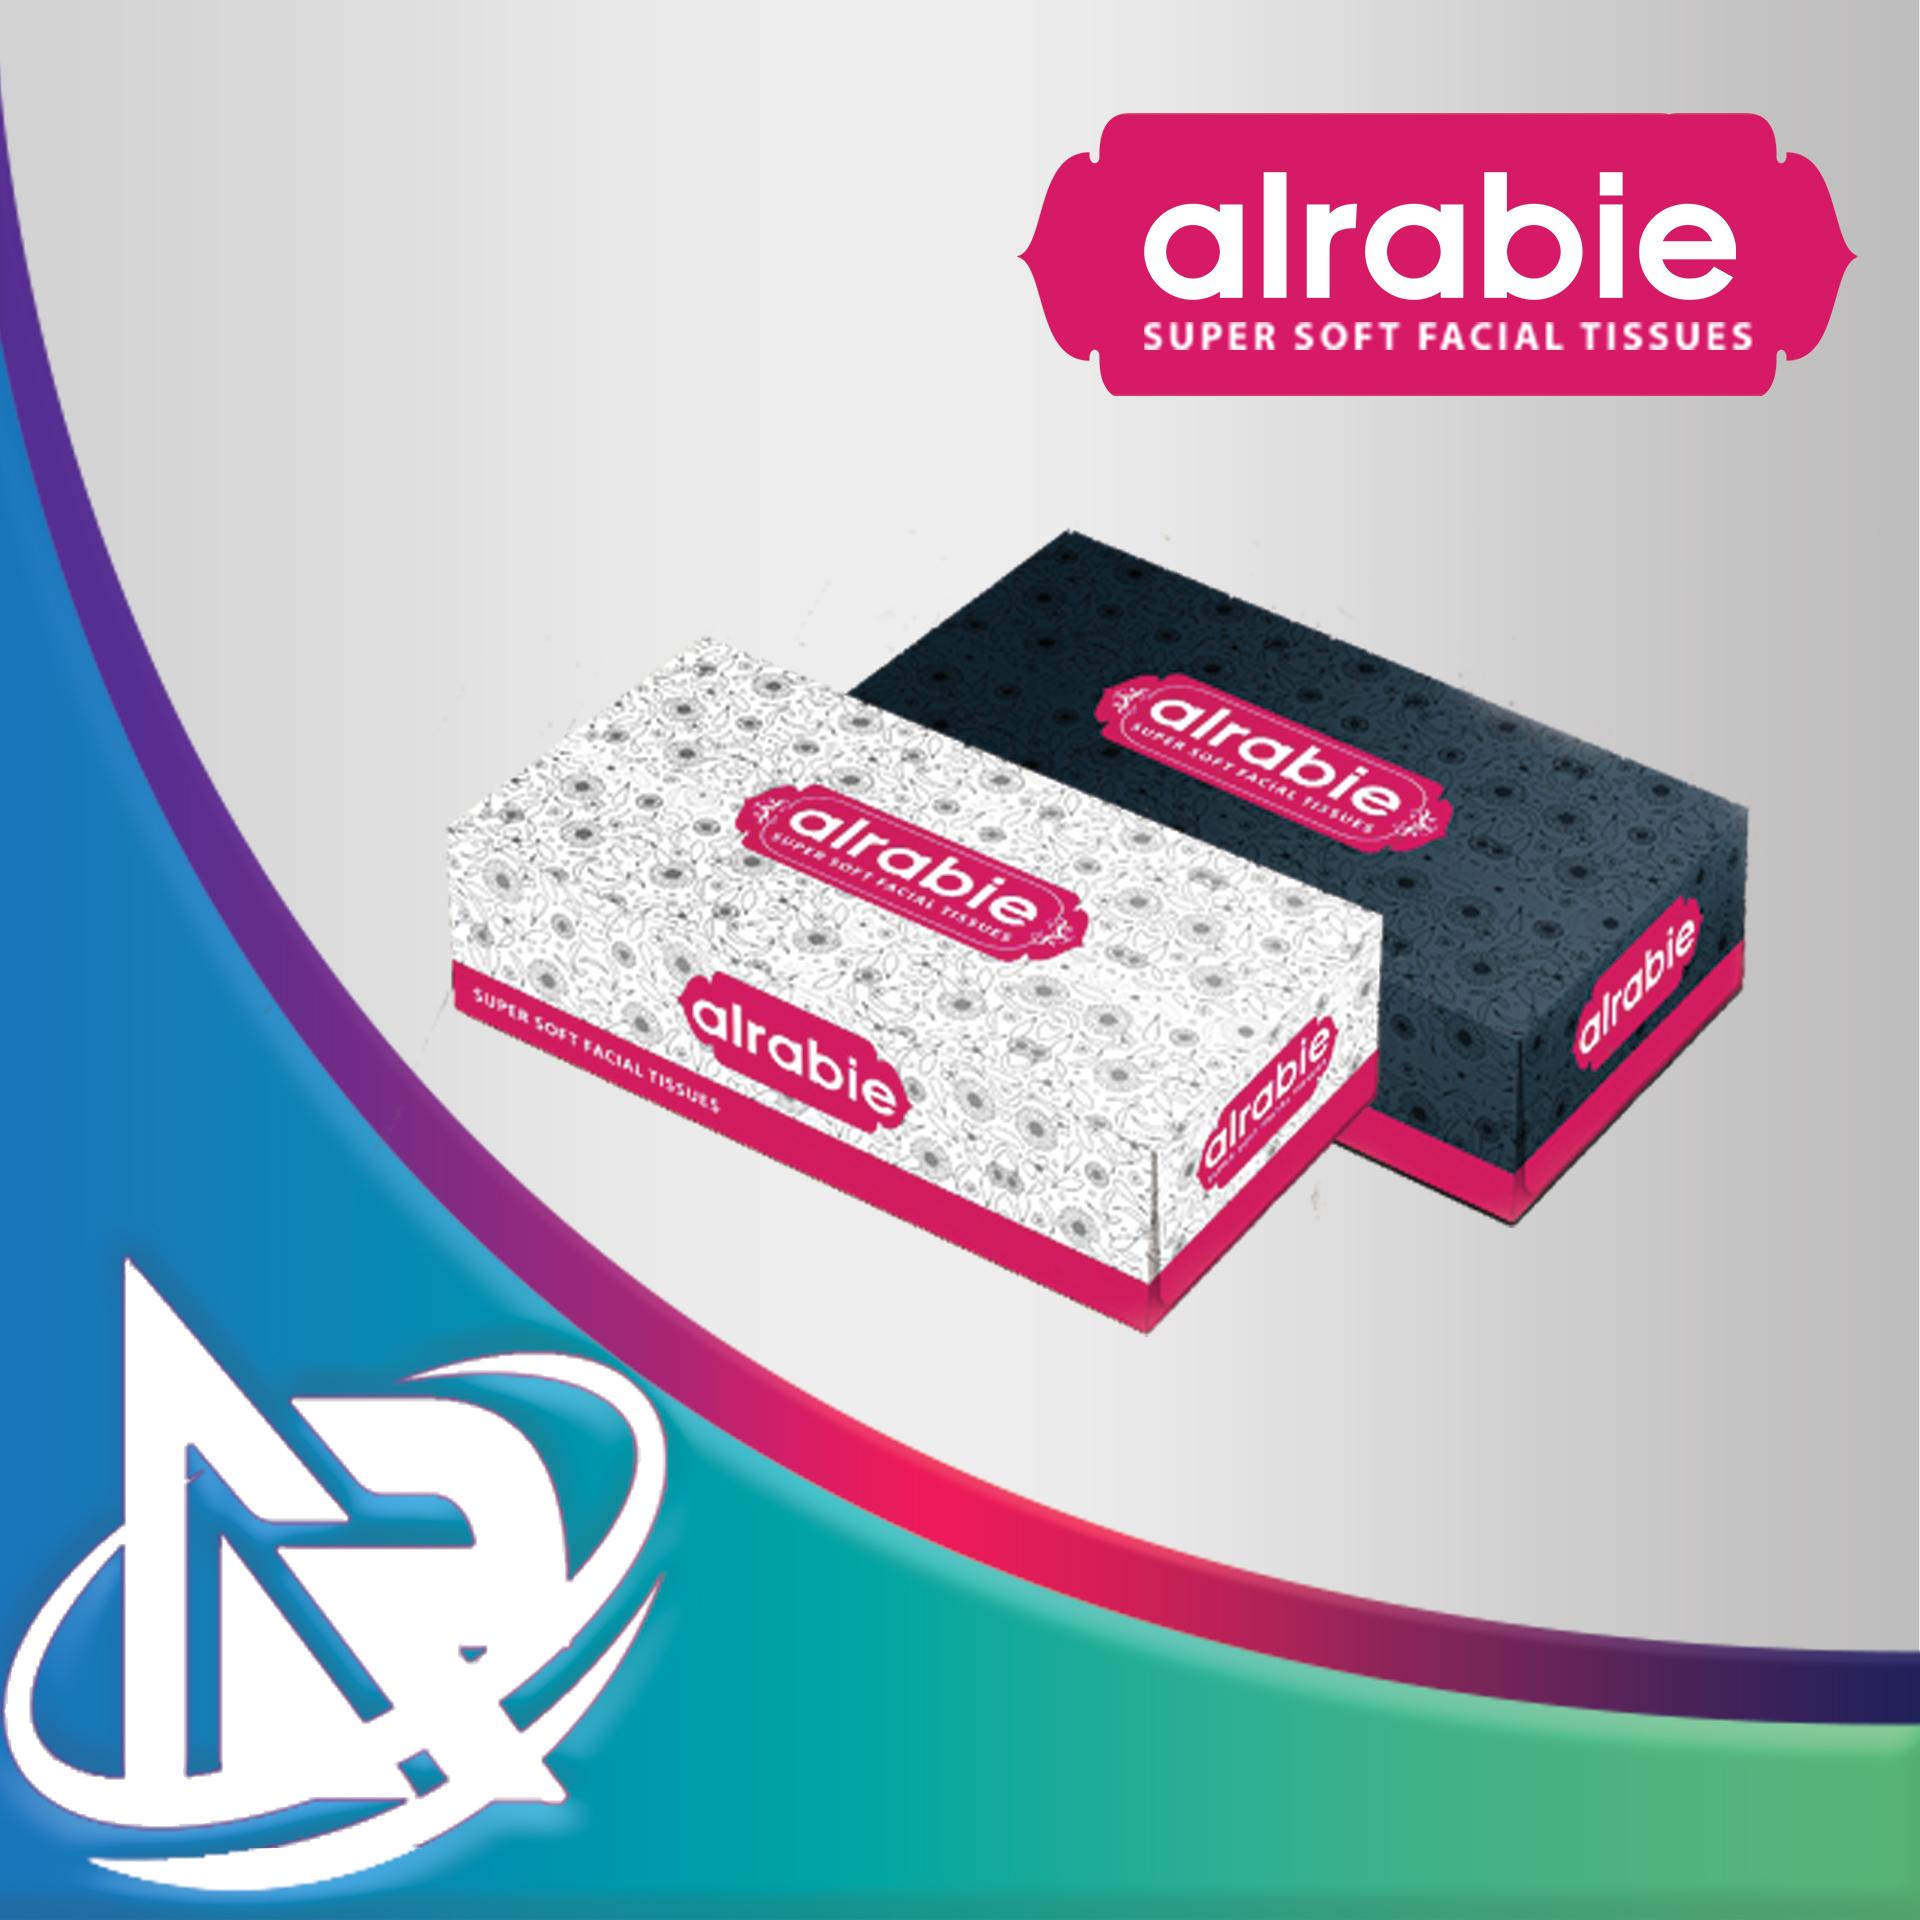 Alrabie 300 tissues